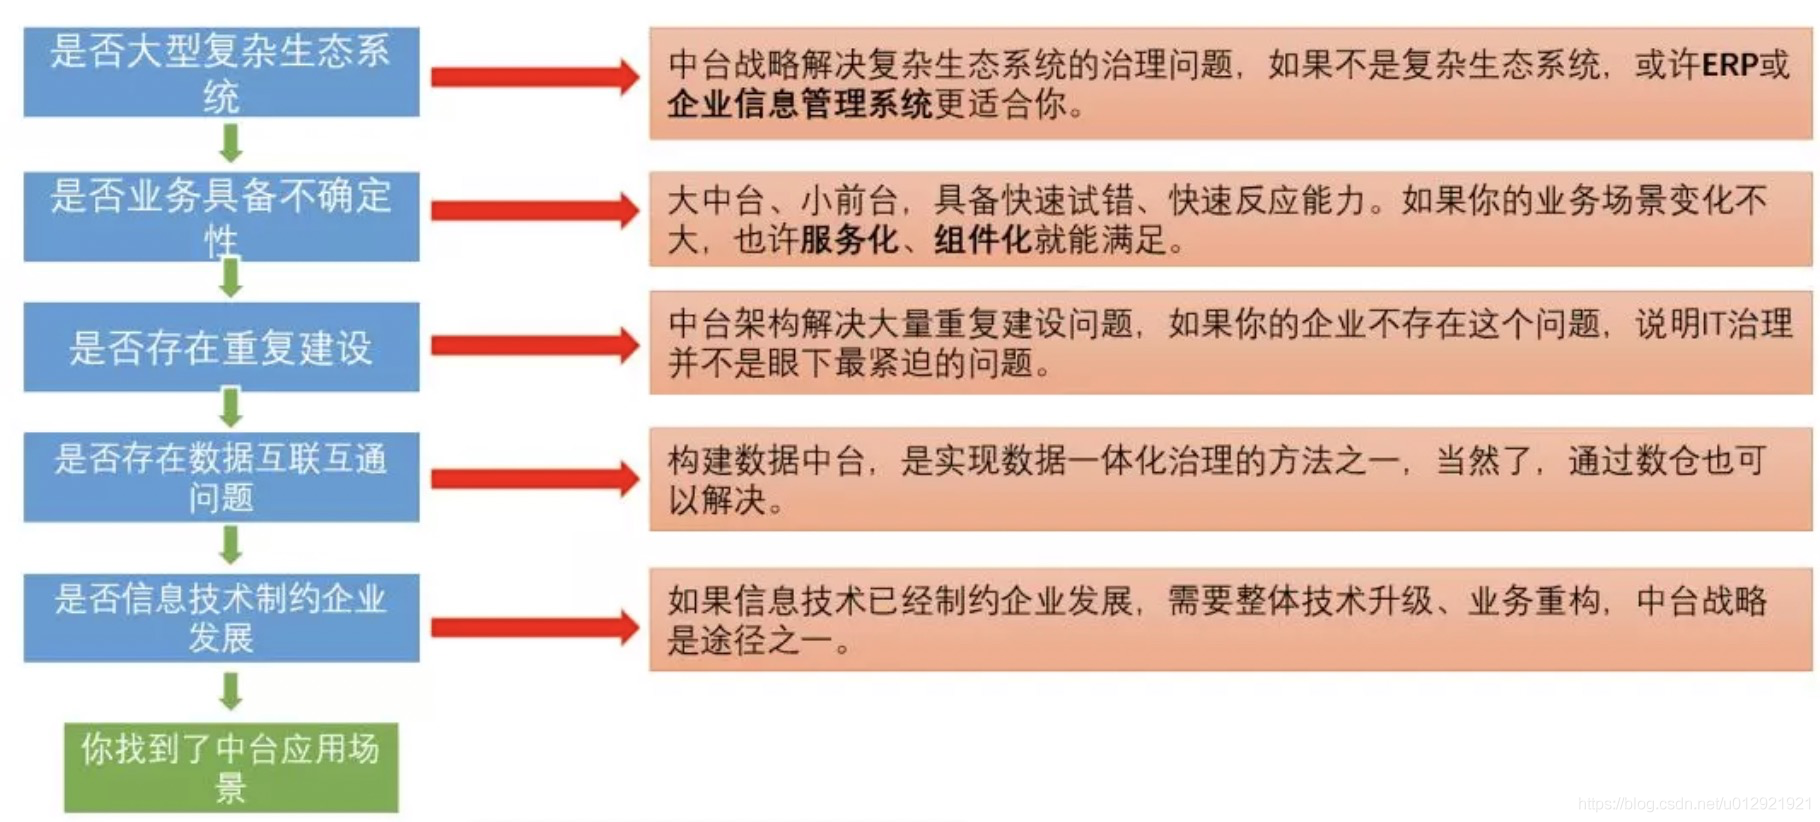 https://img-blog.csdnimg.cn/20200514093254399.png?x-oss-process=image/watermark,type_ZmFuZ3poZW5naGVpdGk,shadow_10,text_aHR0cHM6Ly9ibG9nLmNzZG4ubmV0L3UwMTI5MjE5MjE=,size_16,color_FFFFFF,t_70